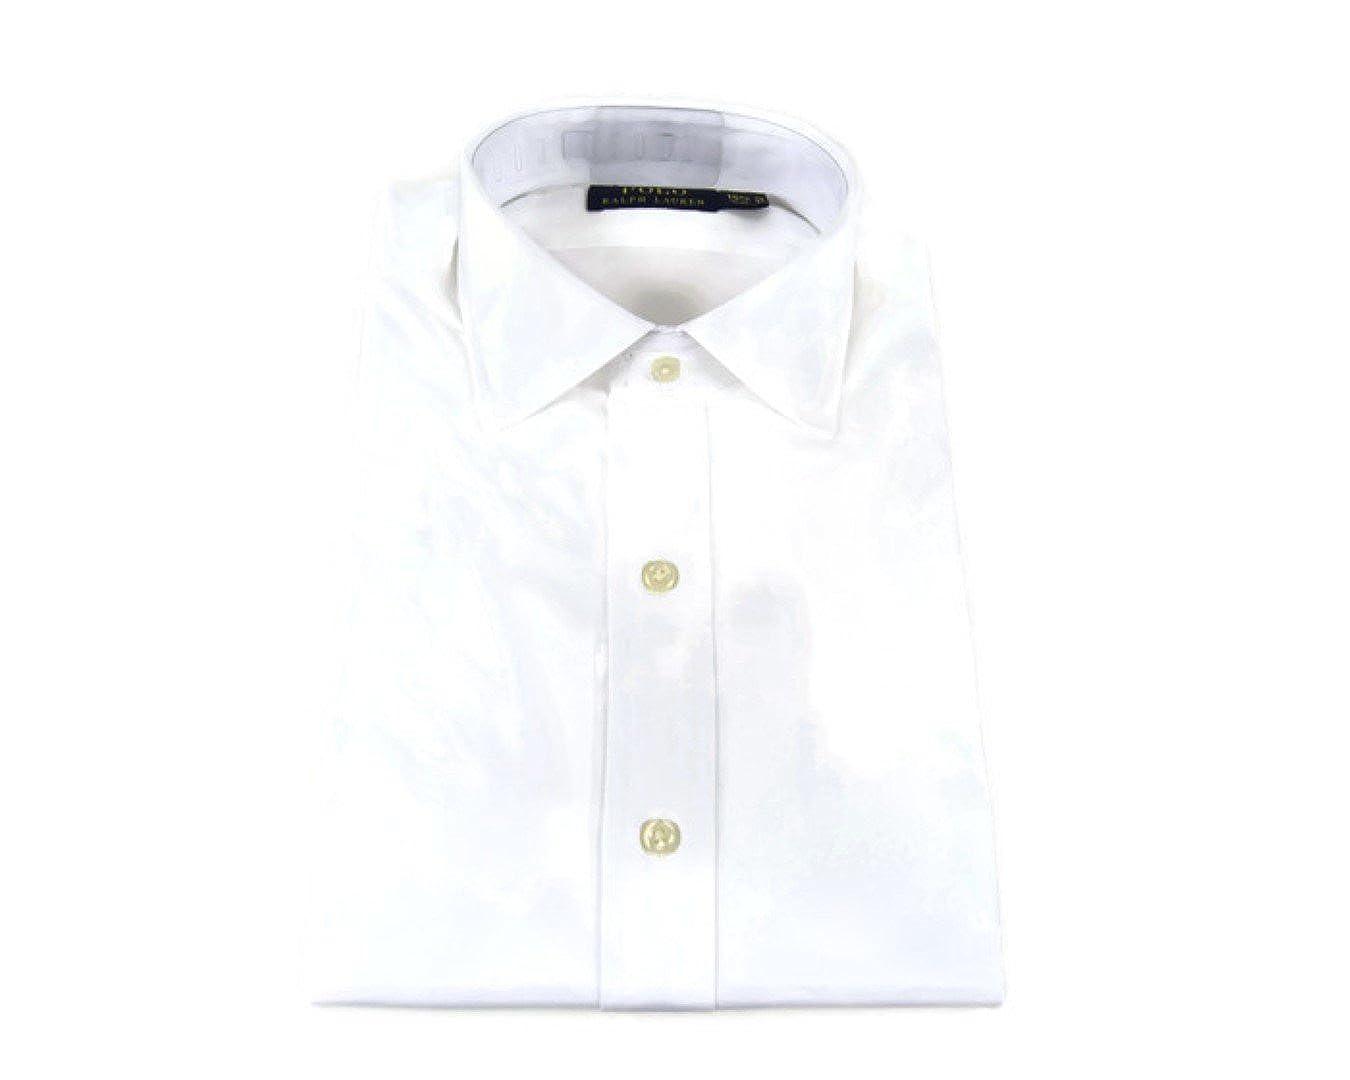 Polo Ralph Lauren Mens Oxford Dress Shirt White 712550513001 17